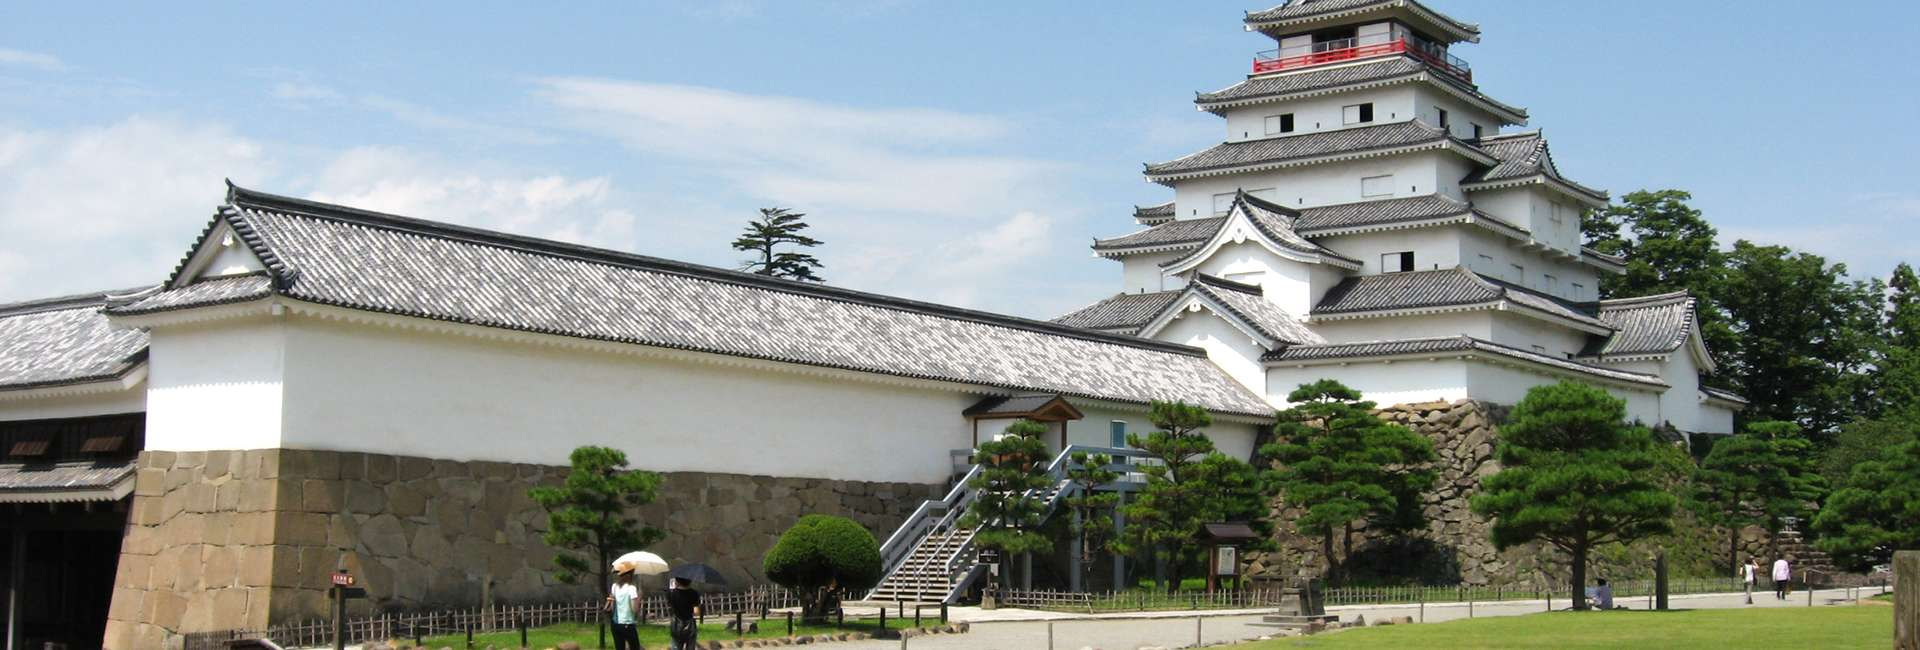 Tsuruga Castle in Aizuwakamatsu